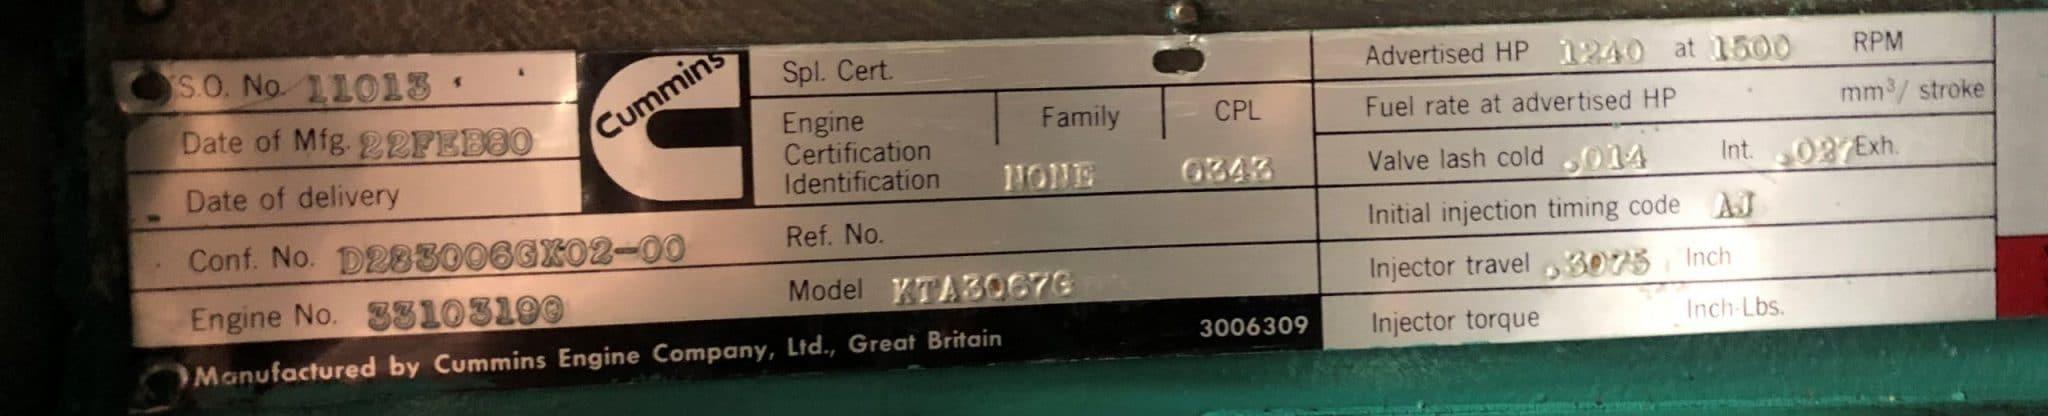 1000 kVA Cummins KTTA-50-G Generator details